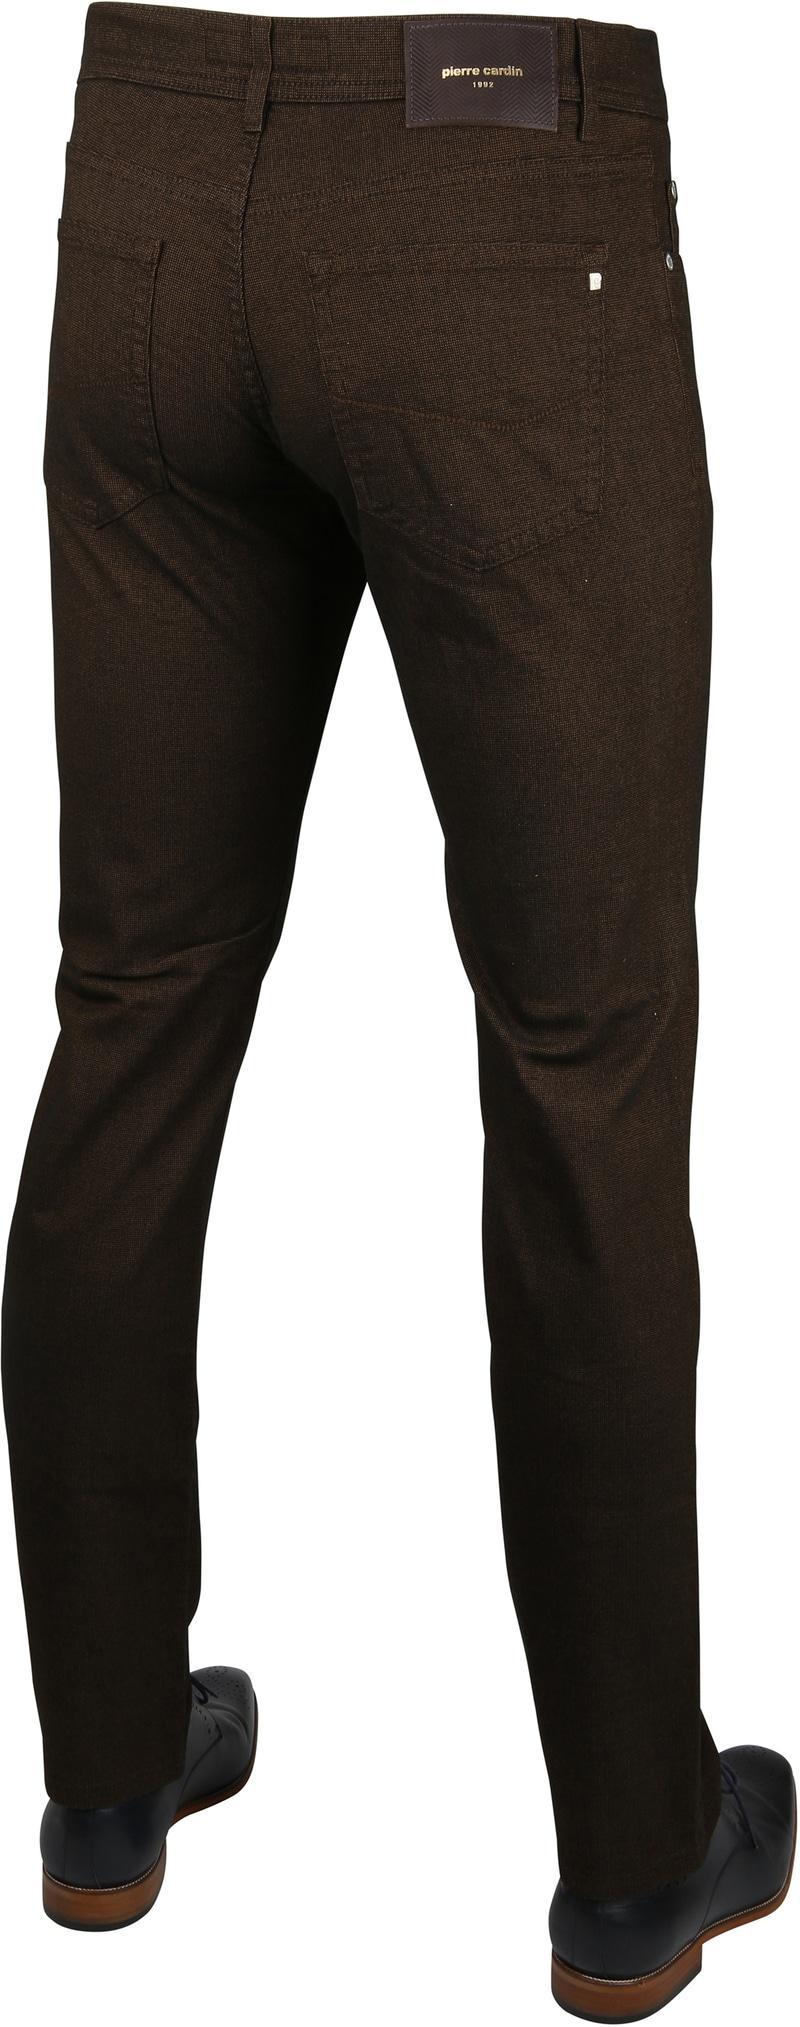 Pierre Cardin Lyon Trousers Caramel photo 2